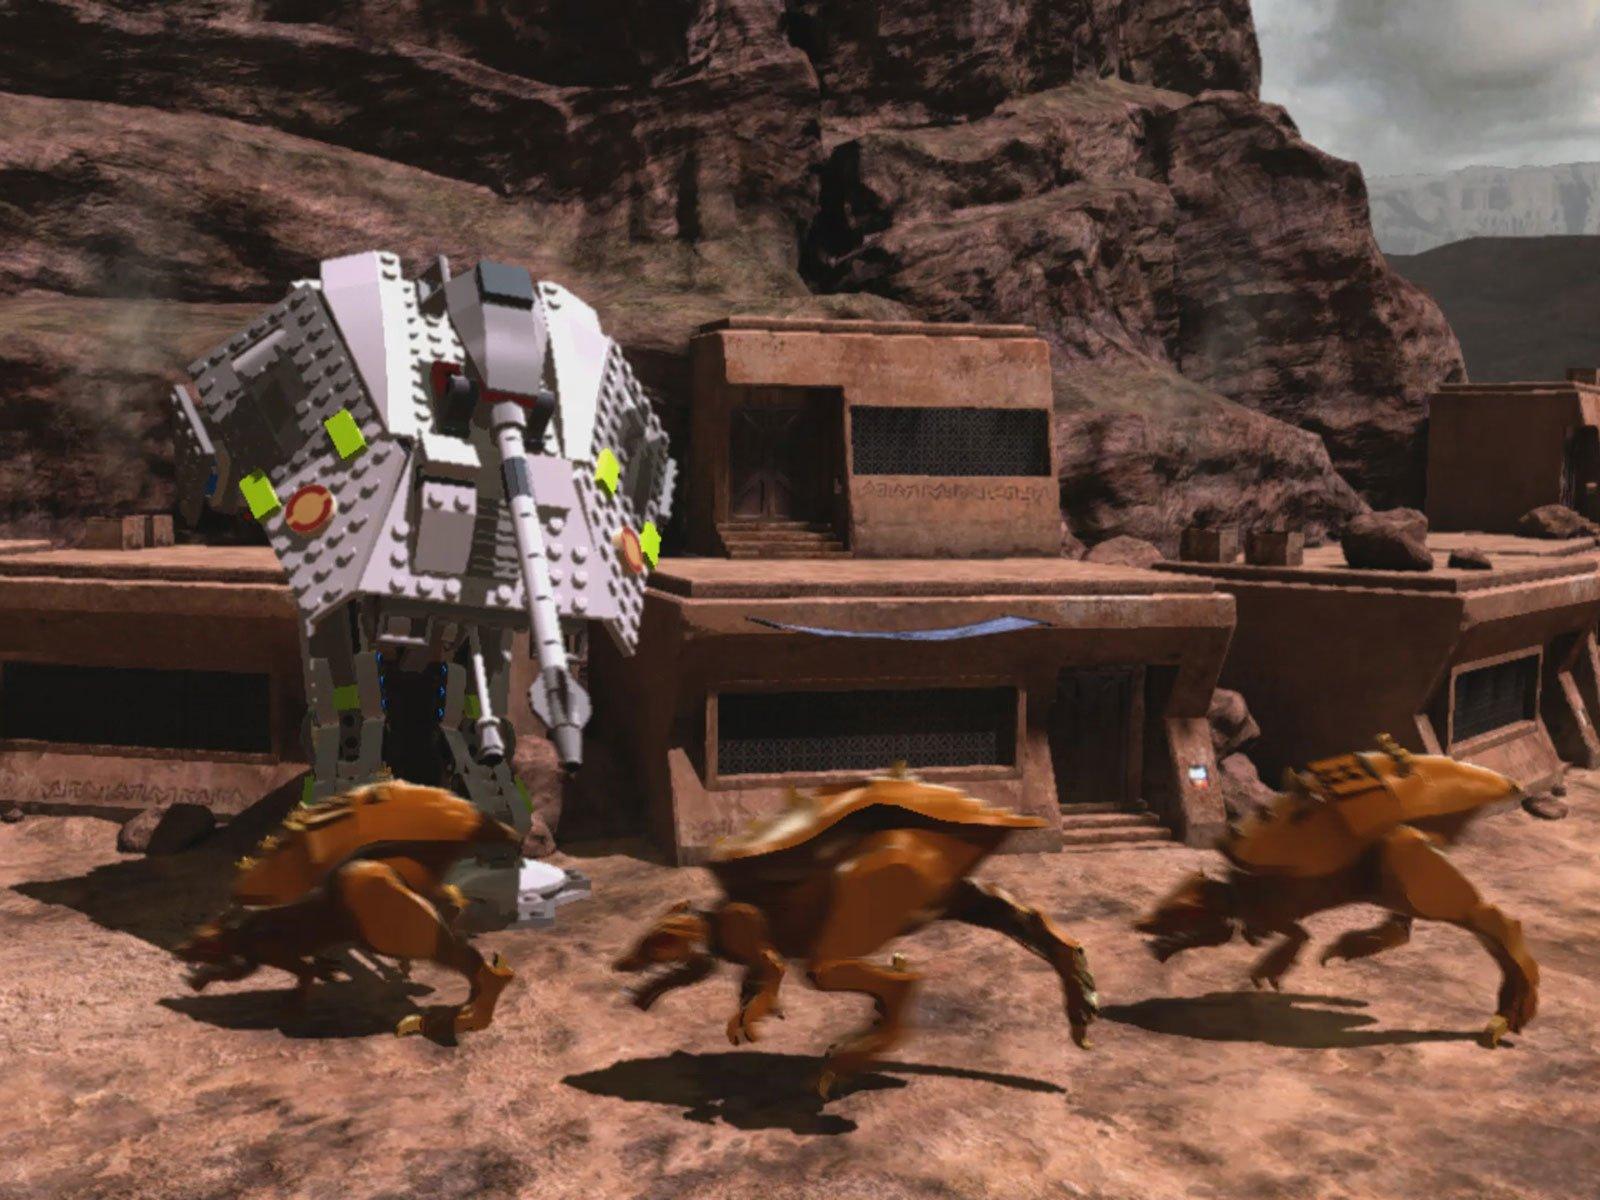 Watch Clip Lego Star Wars Clone Wars Walkthrough Prime Video 1600x1200